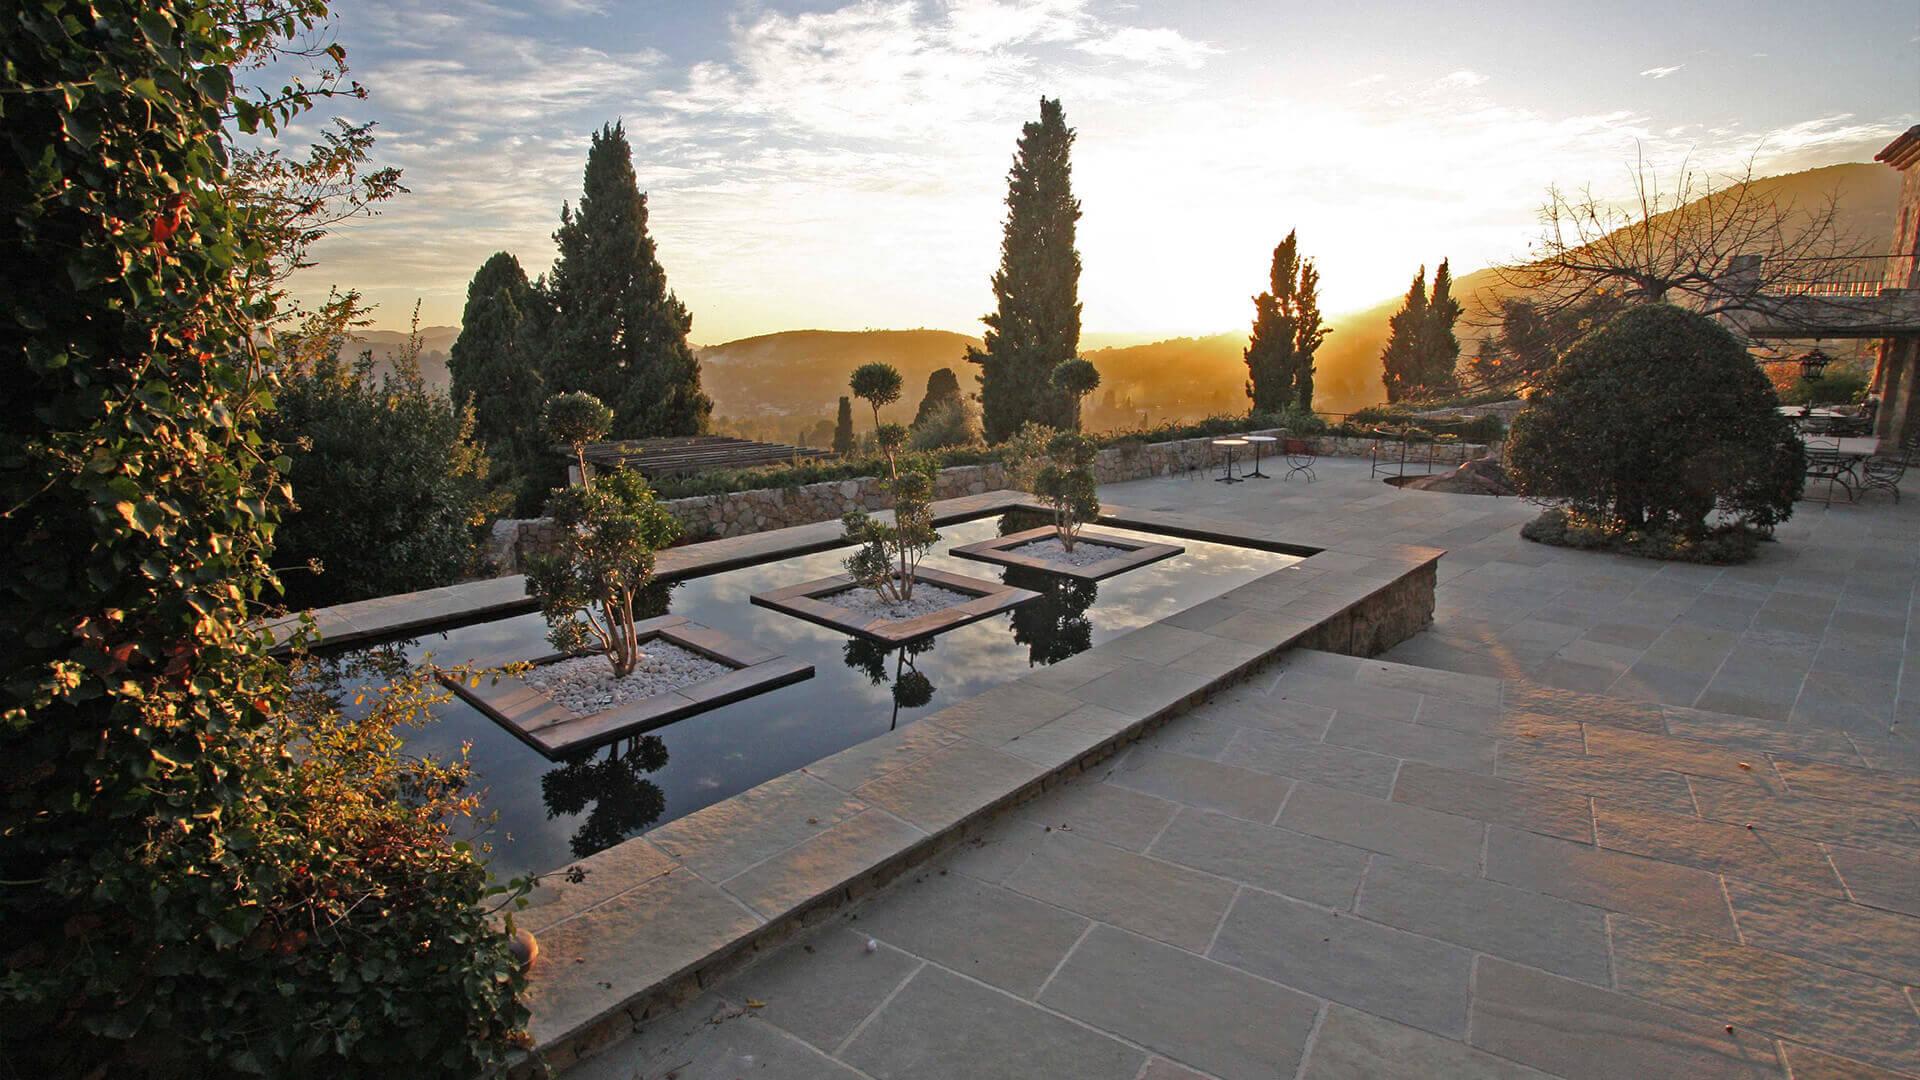 Bastide Provencale villa with view and fountain